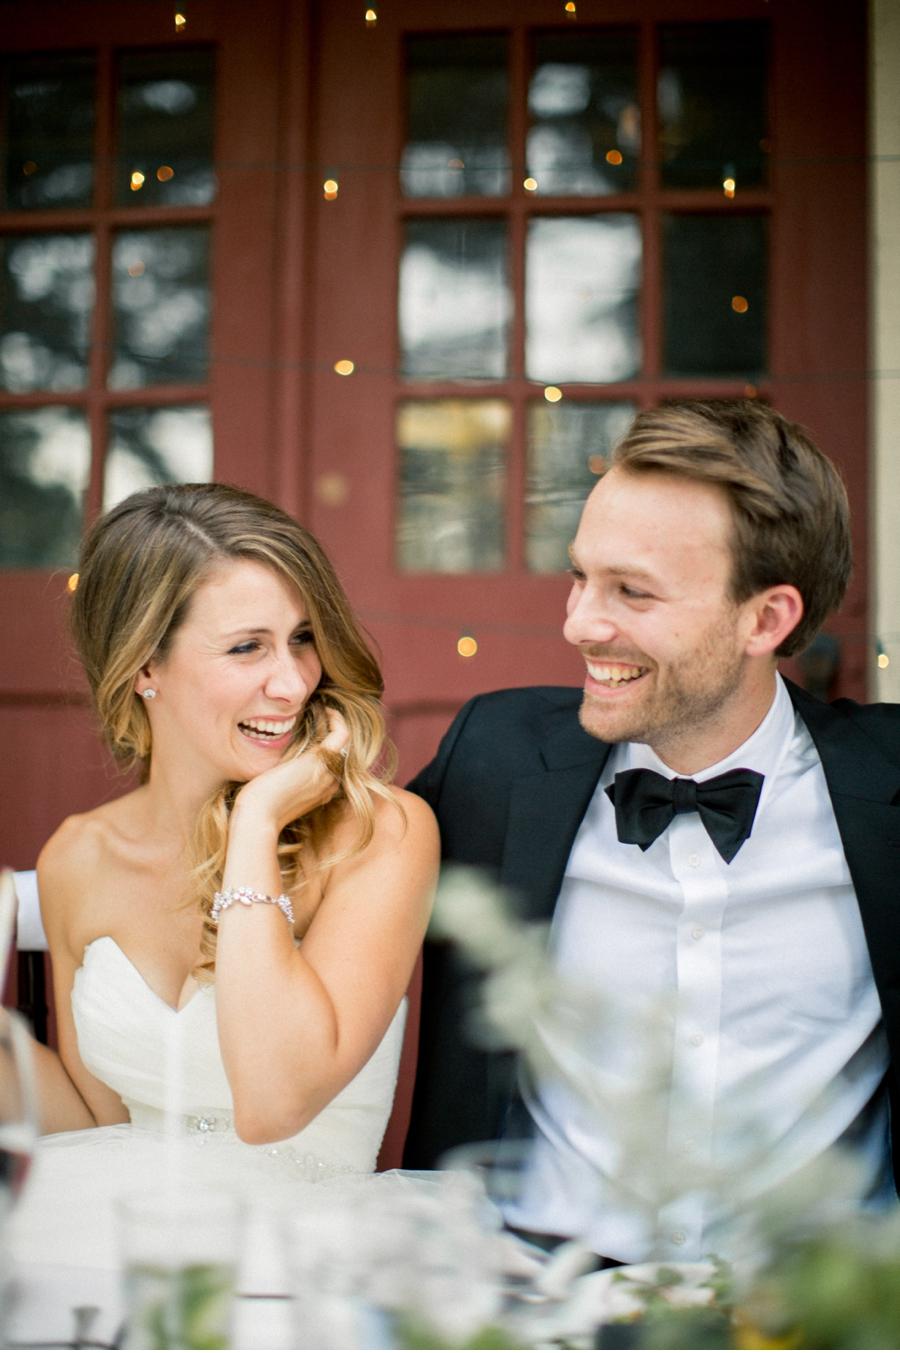 Candian-Fine-Art-Wedding-Photography-Blog